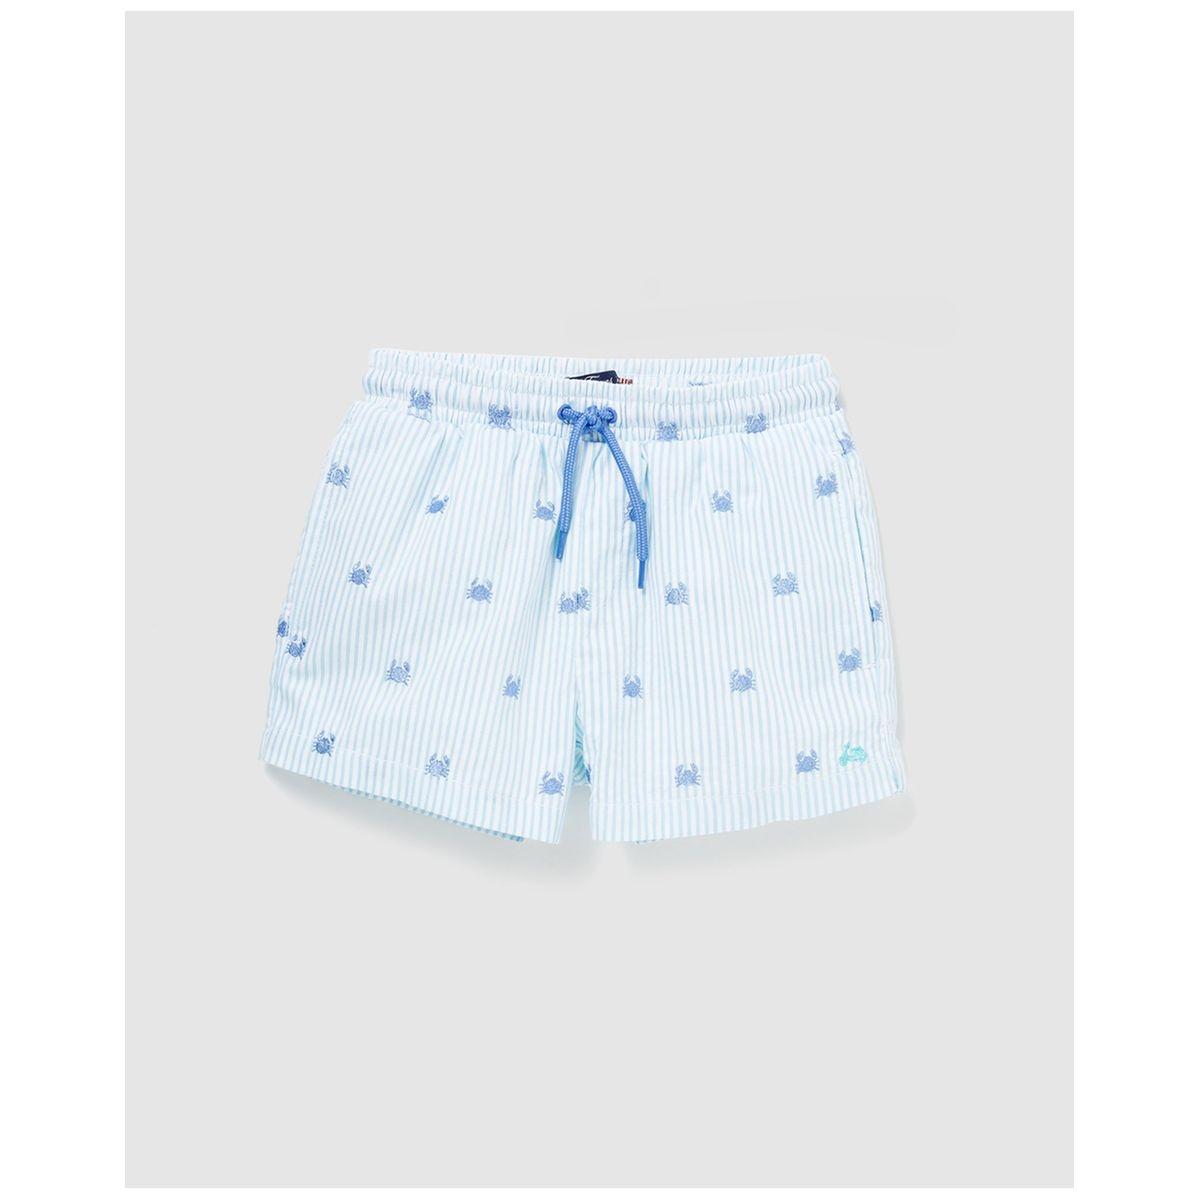 Maillot de bain bleu motif crabes